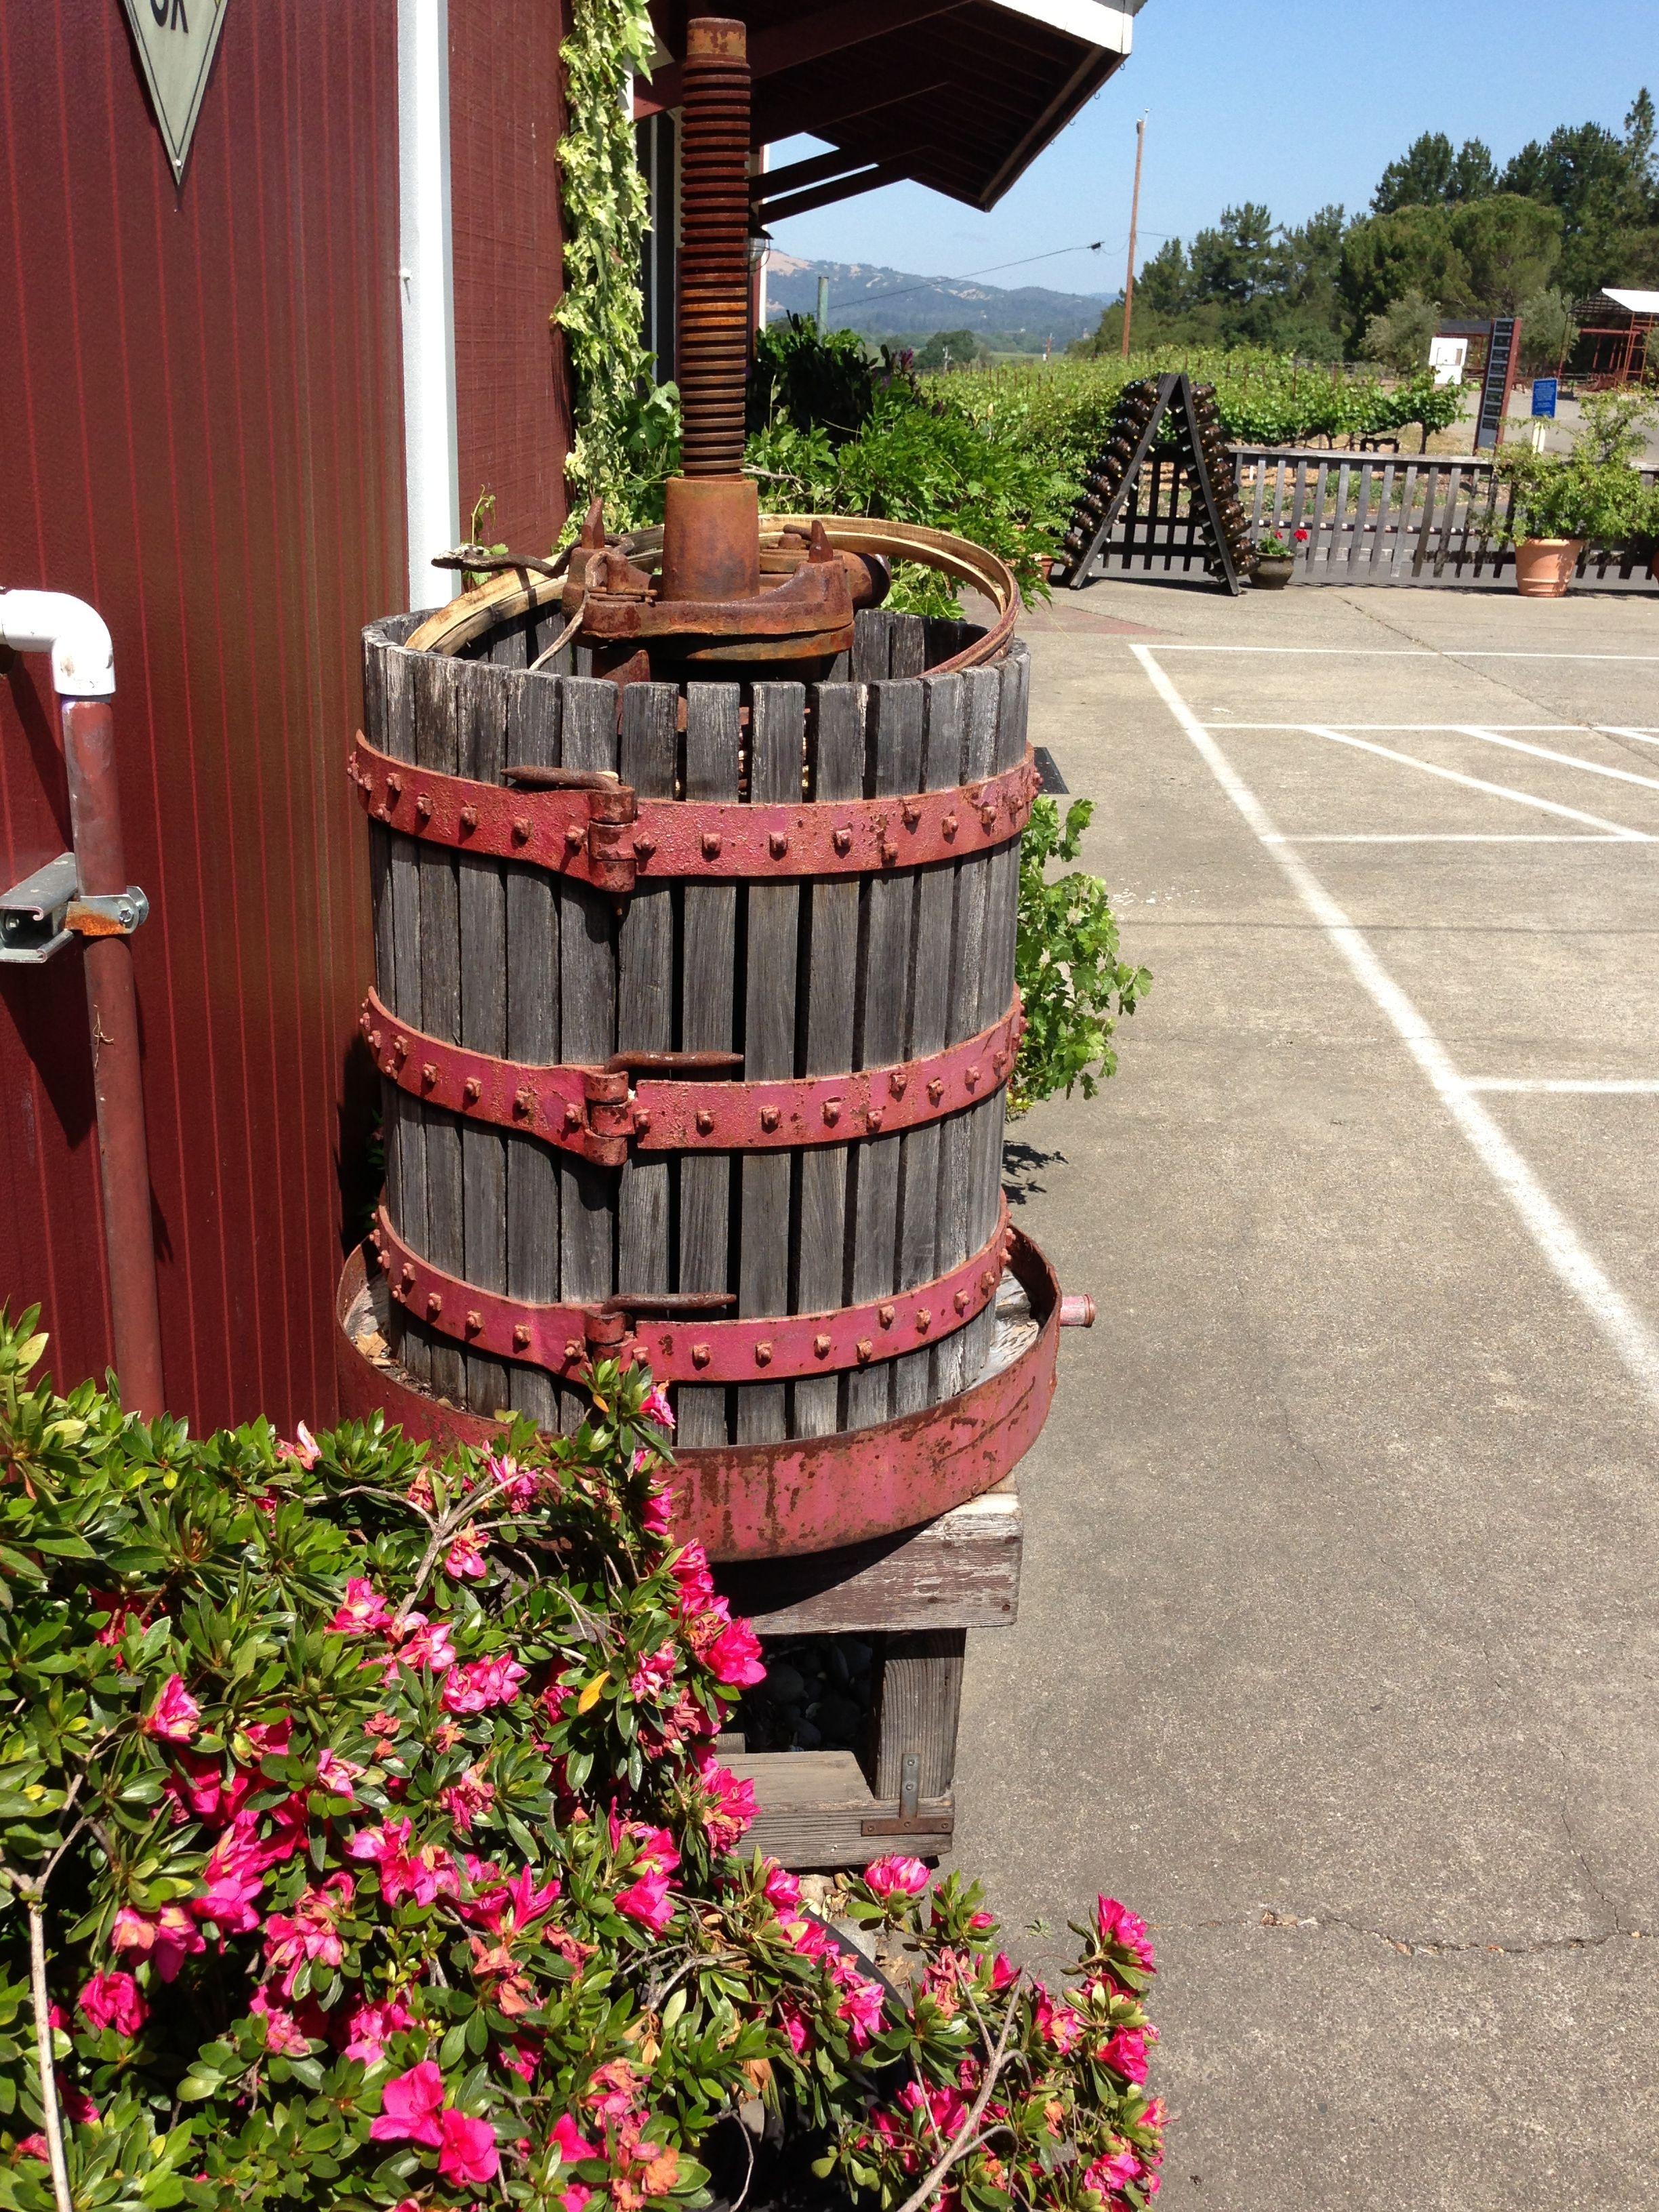 Old Wine Press Papapietro Perry Winery Sonoma County Healdsburg California Wine County Dry Creek Valley Ava Wine Press Healdsburg California Healdsburg